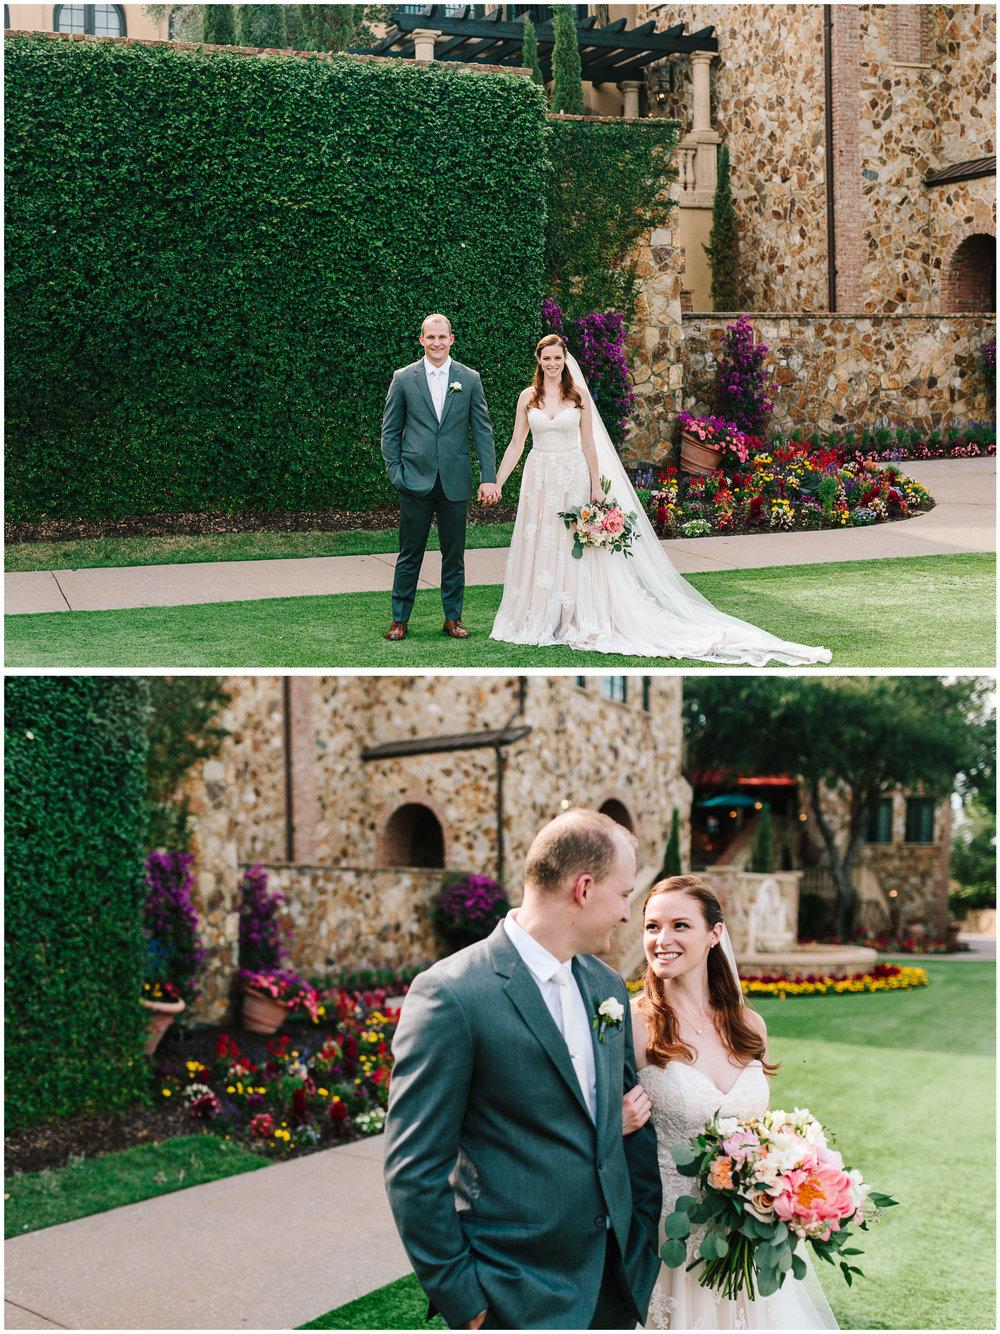 bella_collina_wedding_63.jpg